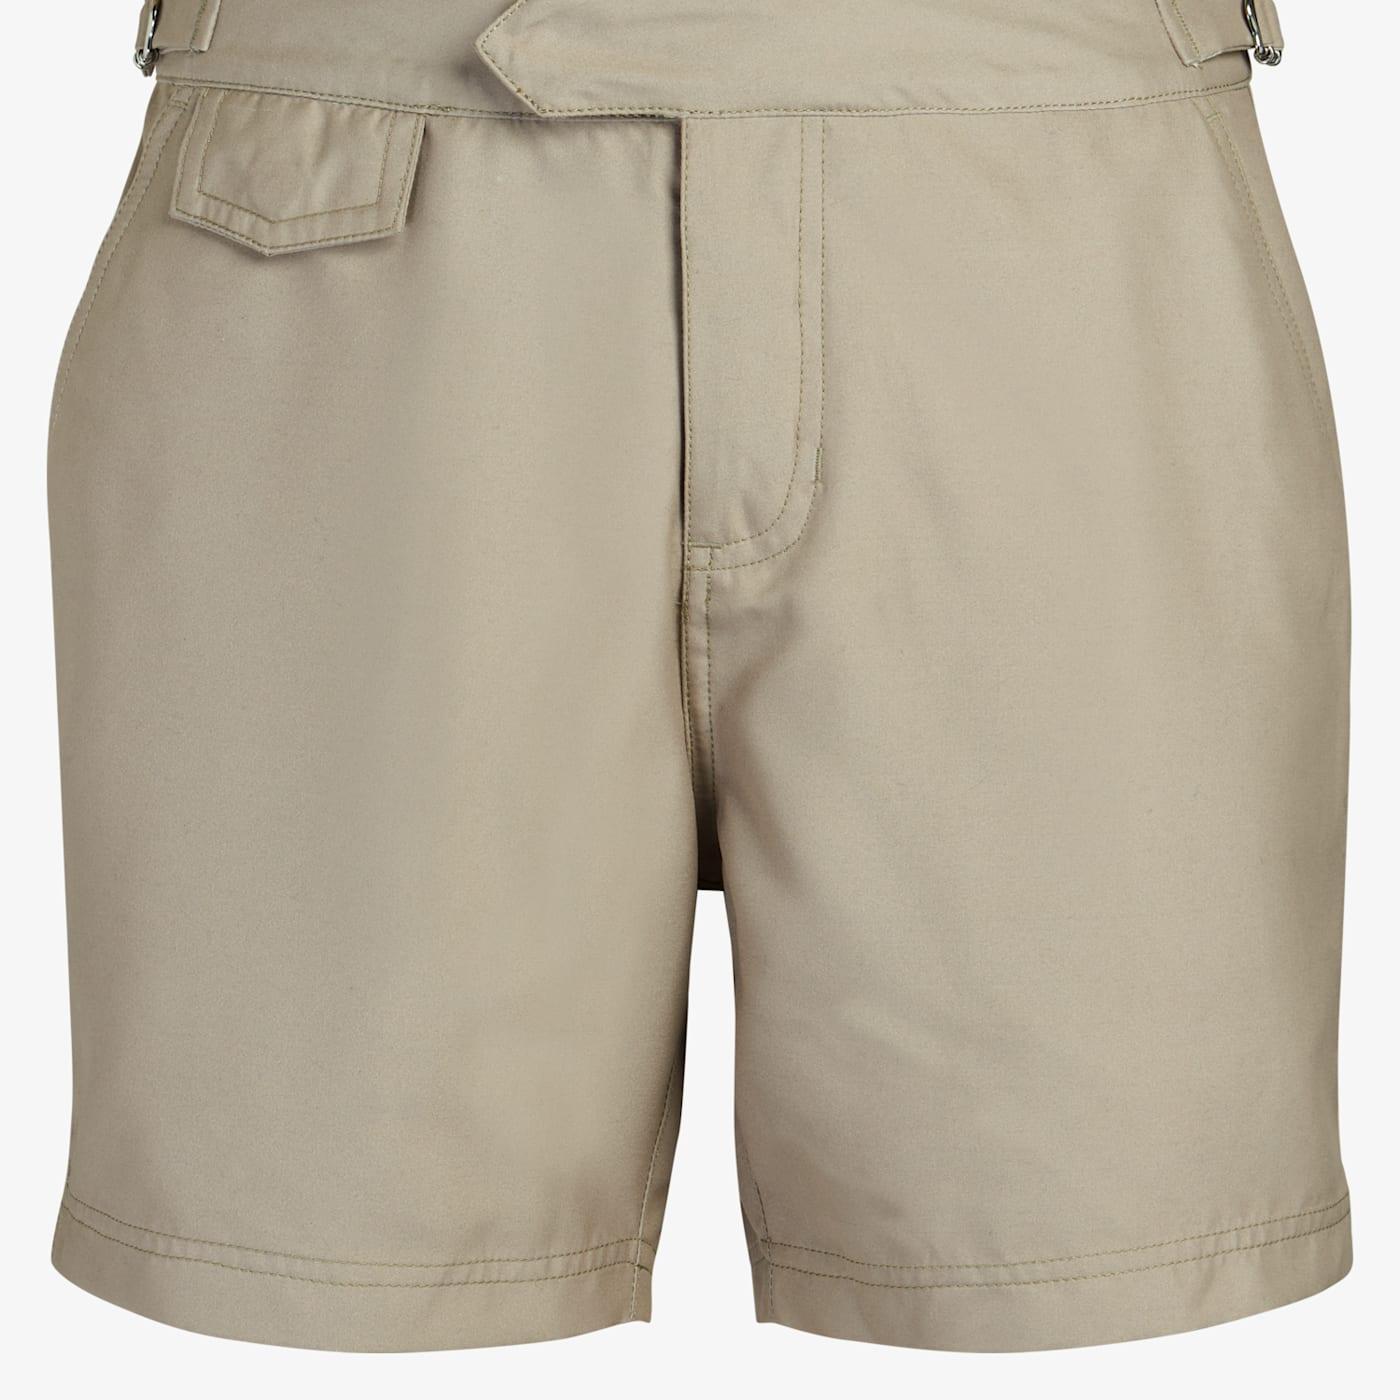 Vintage Men's Swimsuits – 1930s to 1970s History Khaki Swim Shorts $79.00 AT vintagedancer.com